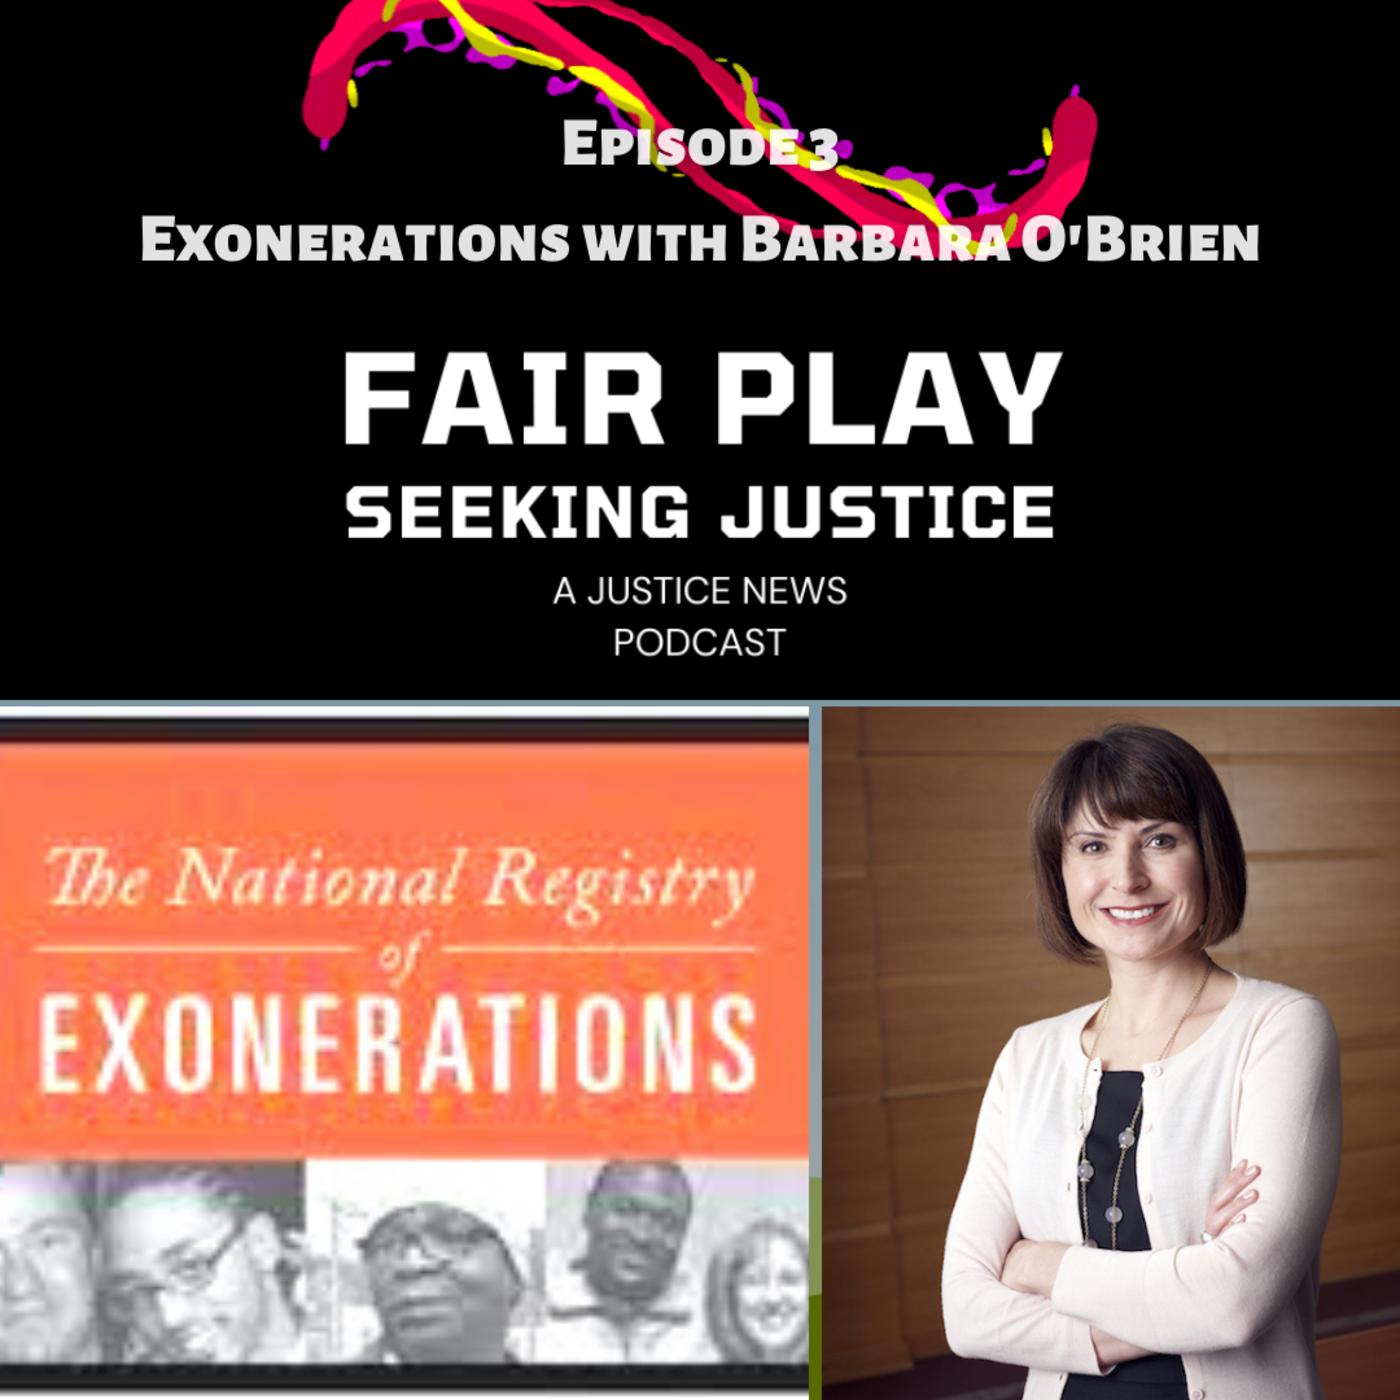 FairPlay Ep3 | Exonerations with Barbara O'Brien